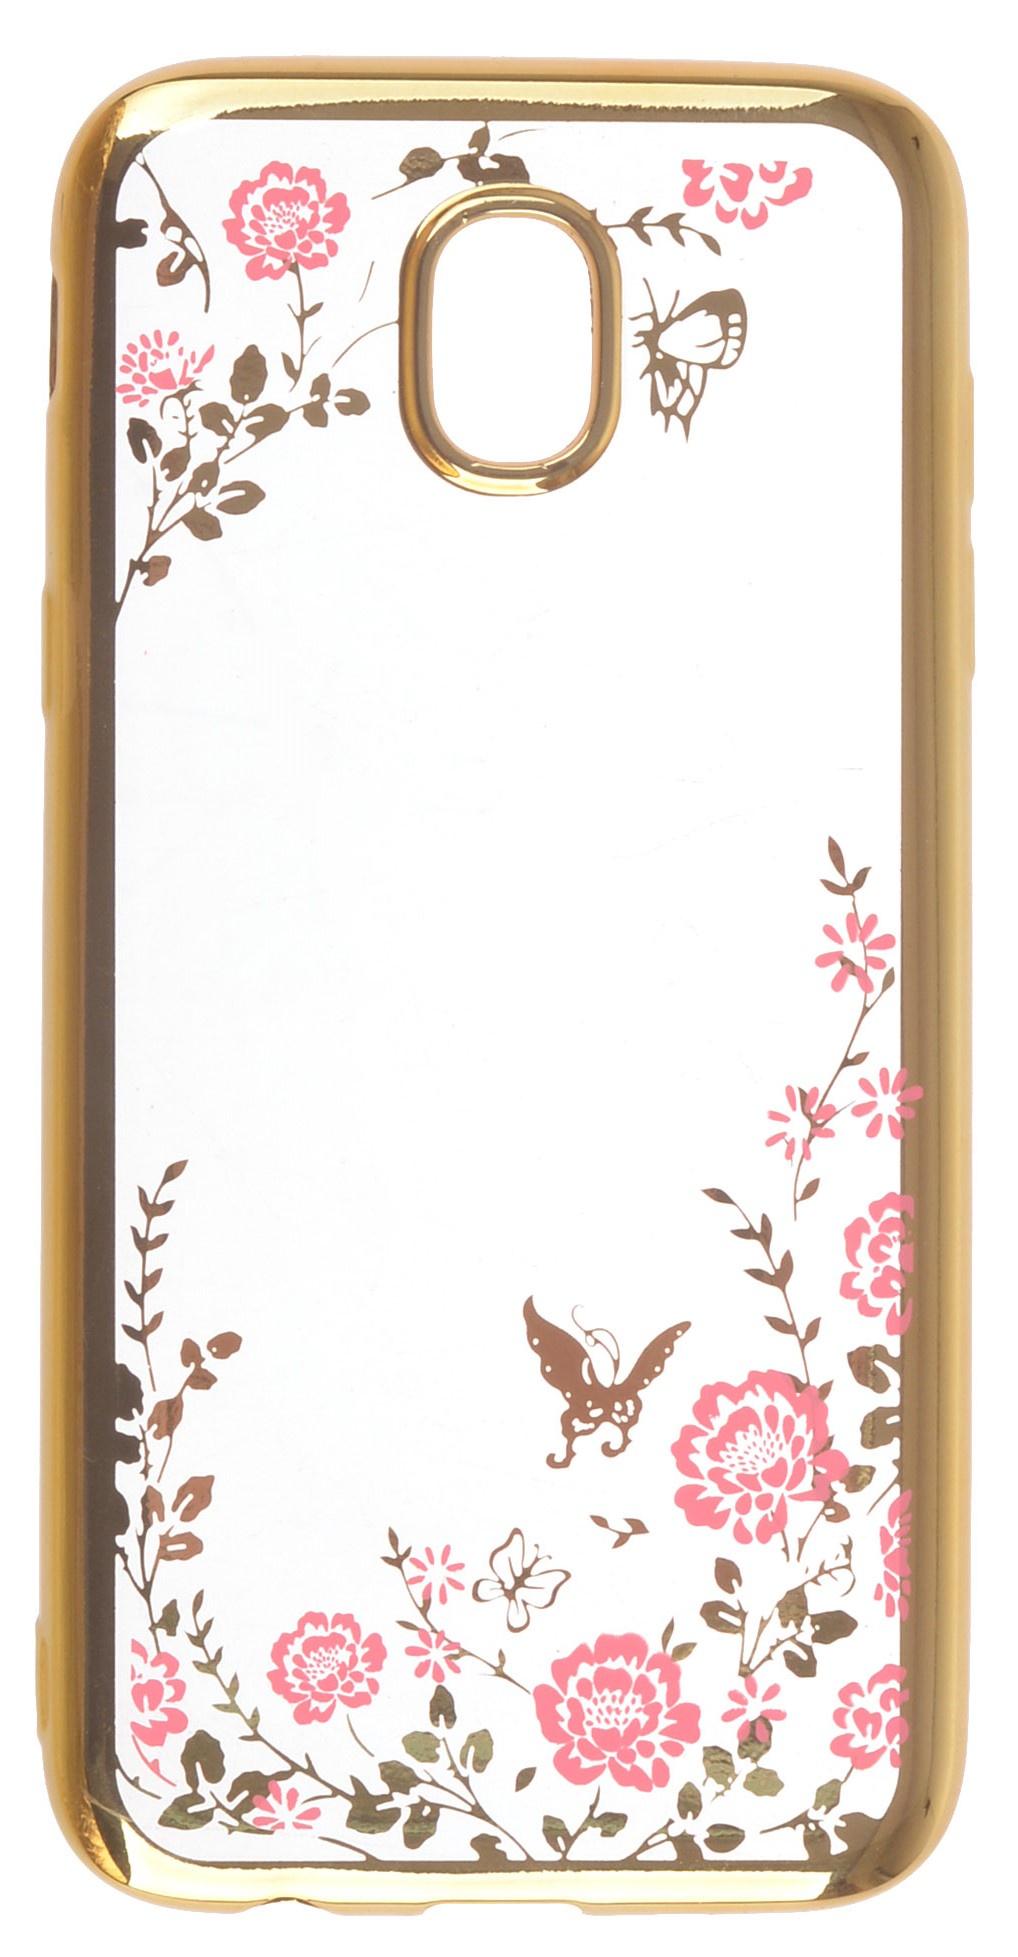 Чехол для сотового телефона skinBOX silicone chrome border color style 1, 4660041402216, розовый skinbox silicone chrome border color style 1 4people чехол для apple iphone 7 8 green